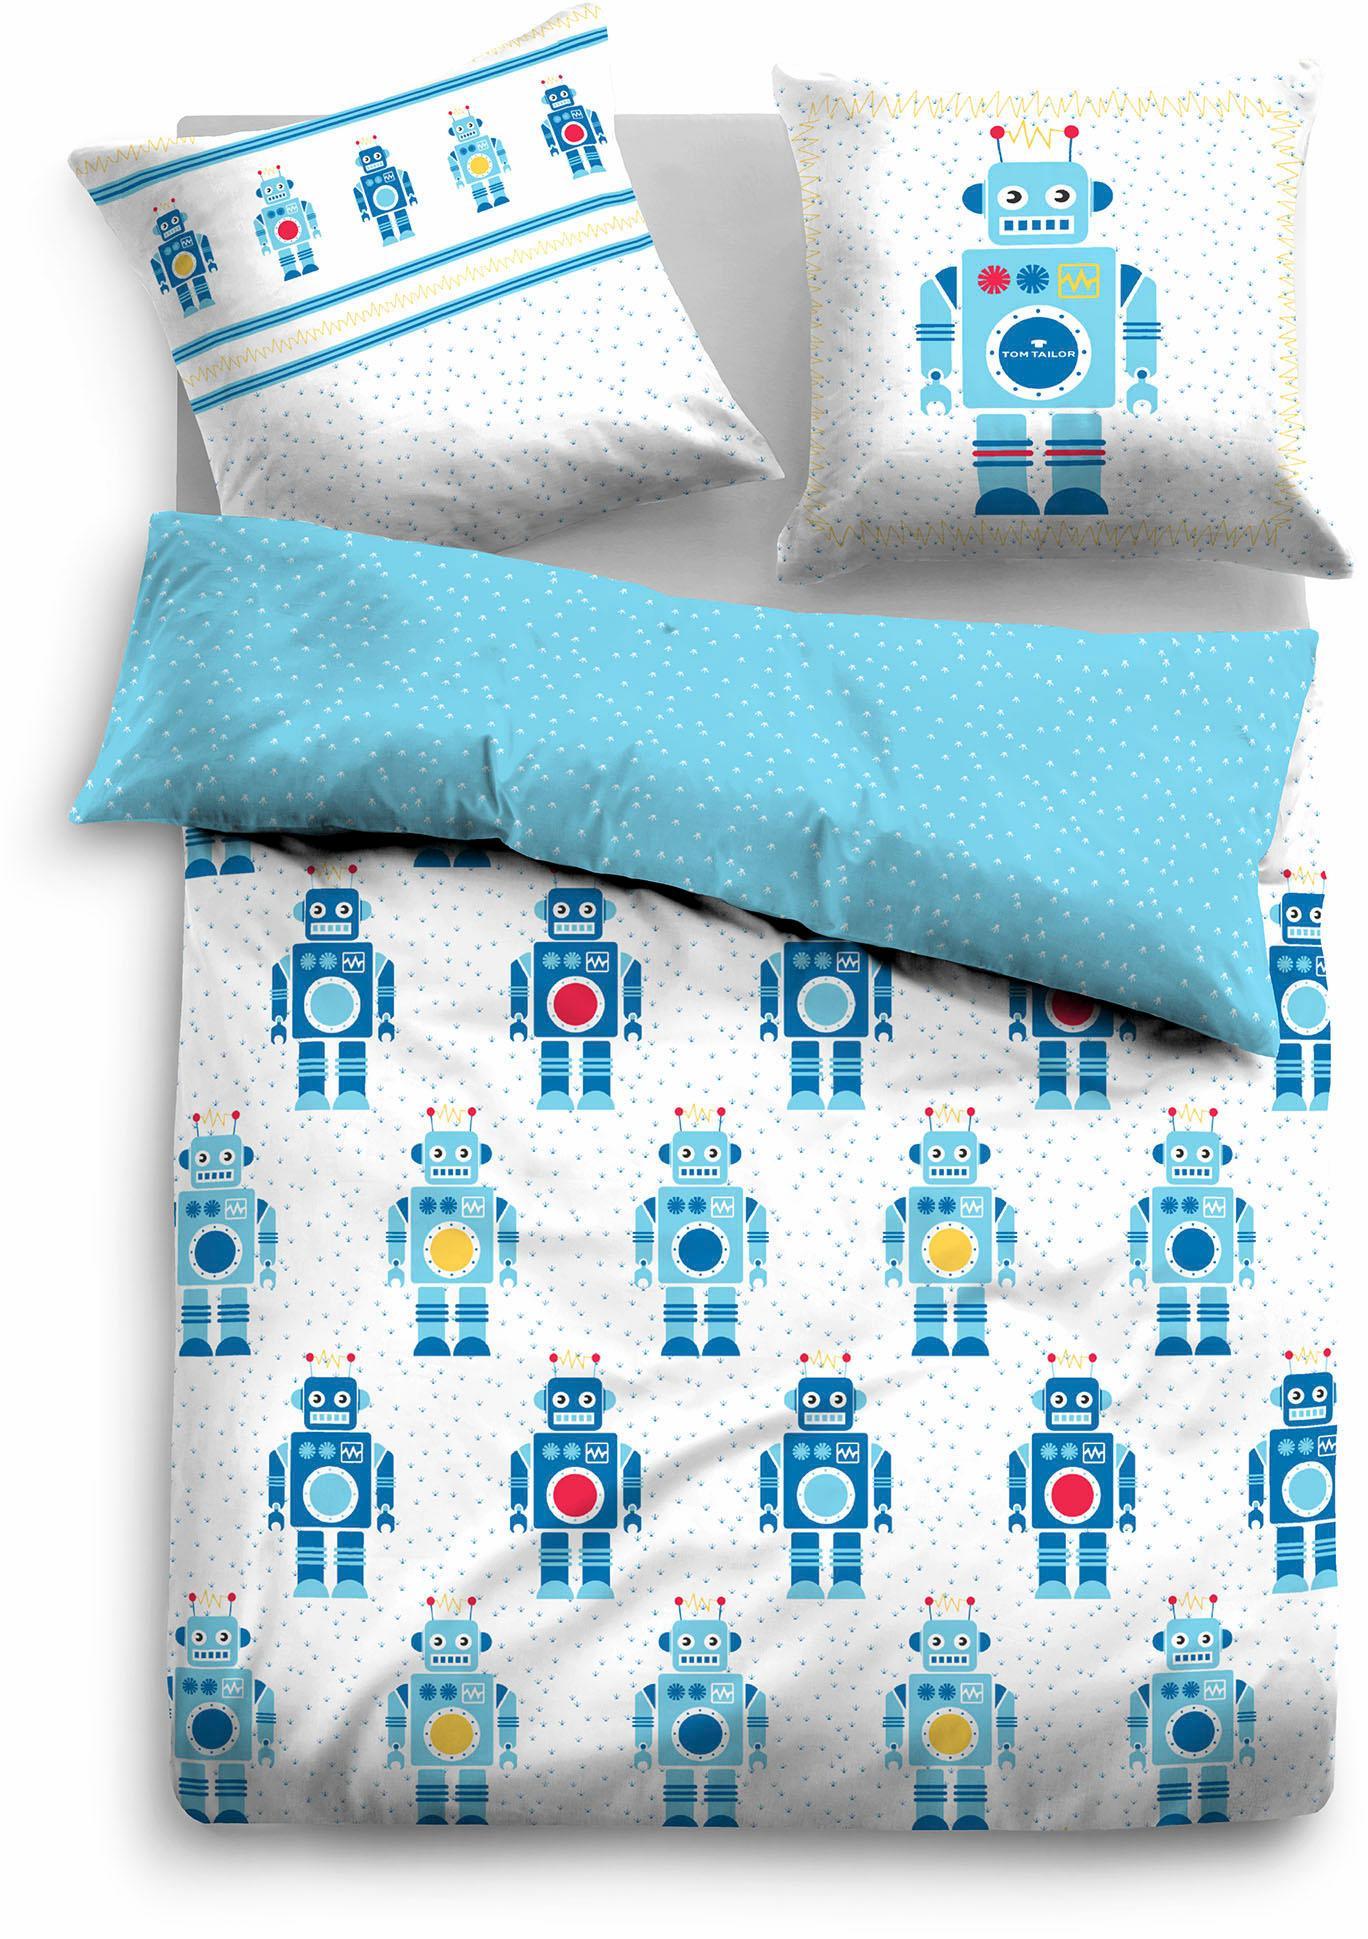 Kinderbettwäsche Beni TOM TAILOR | Kinderzimmer > Textilien für Kinder > Kinderbettwäsche | Blau | Tom Tailor